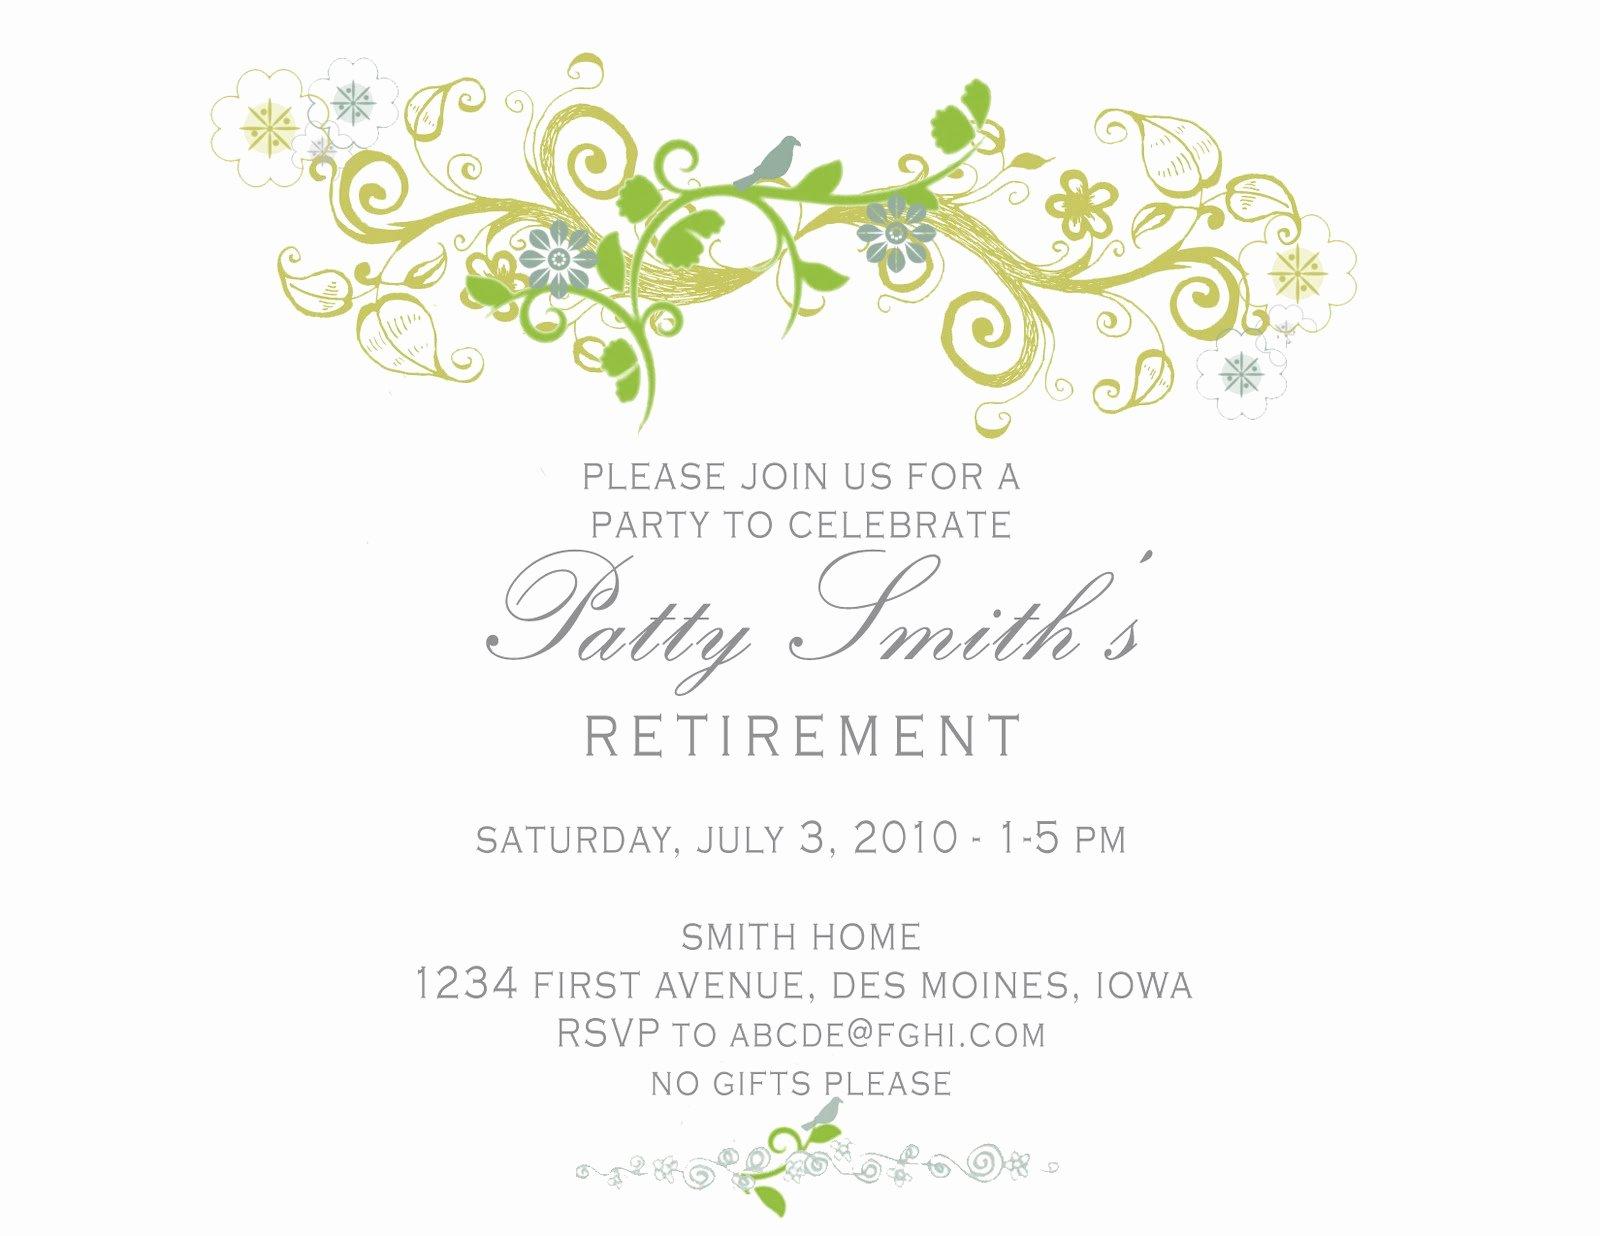 Retirement Party Invitations Templates Unique Idesign A Retirement Party Invitation